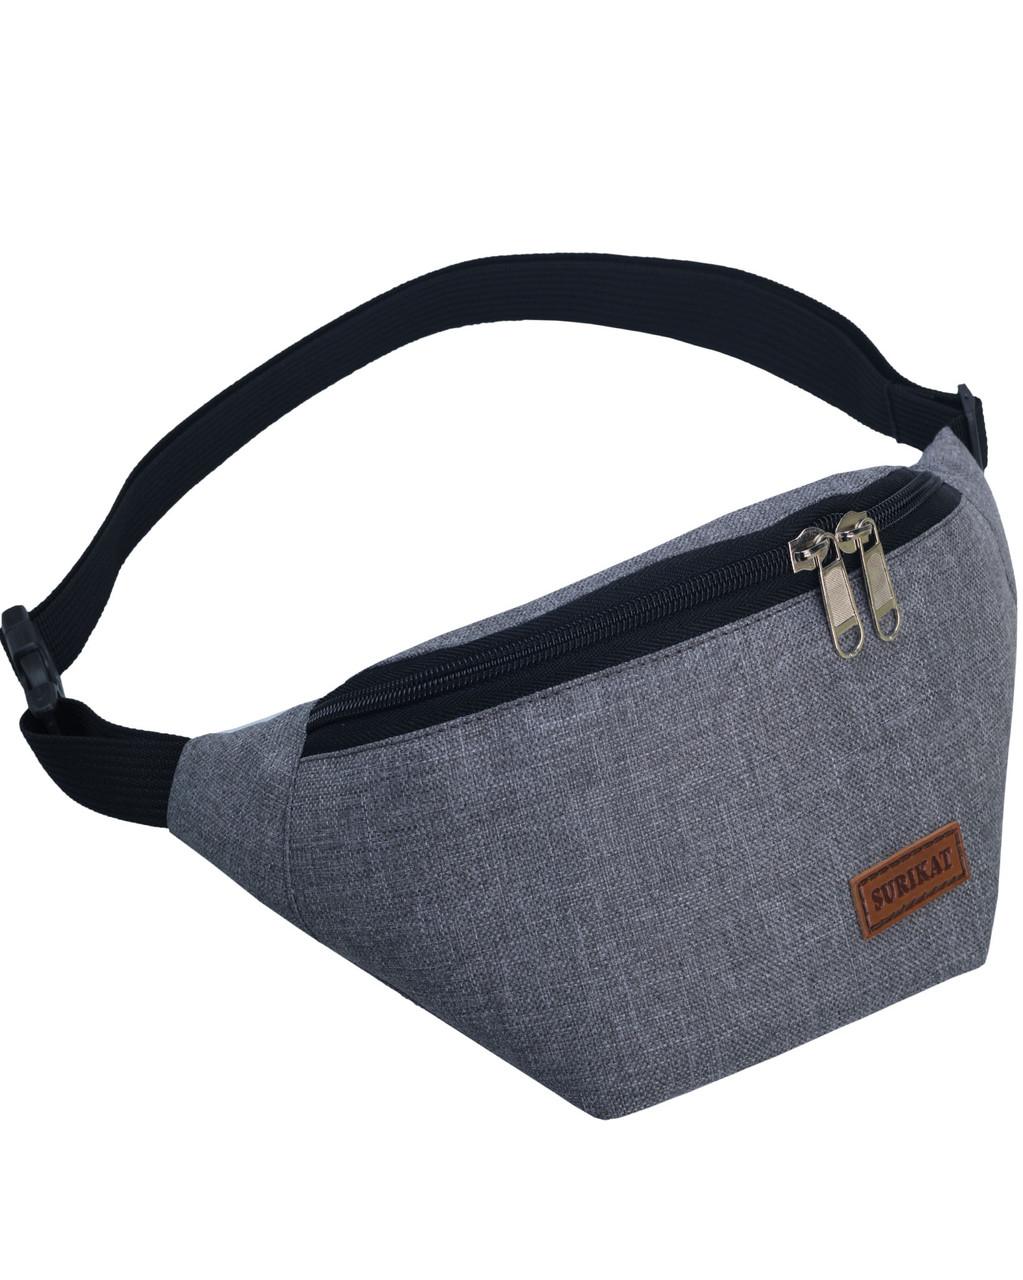 Сумка на пояс бананка Tempo Surikat меланж серый (сумка на пояс, сумки